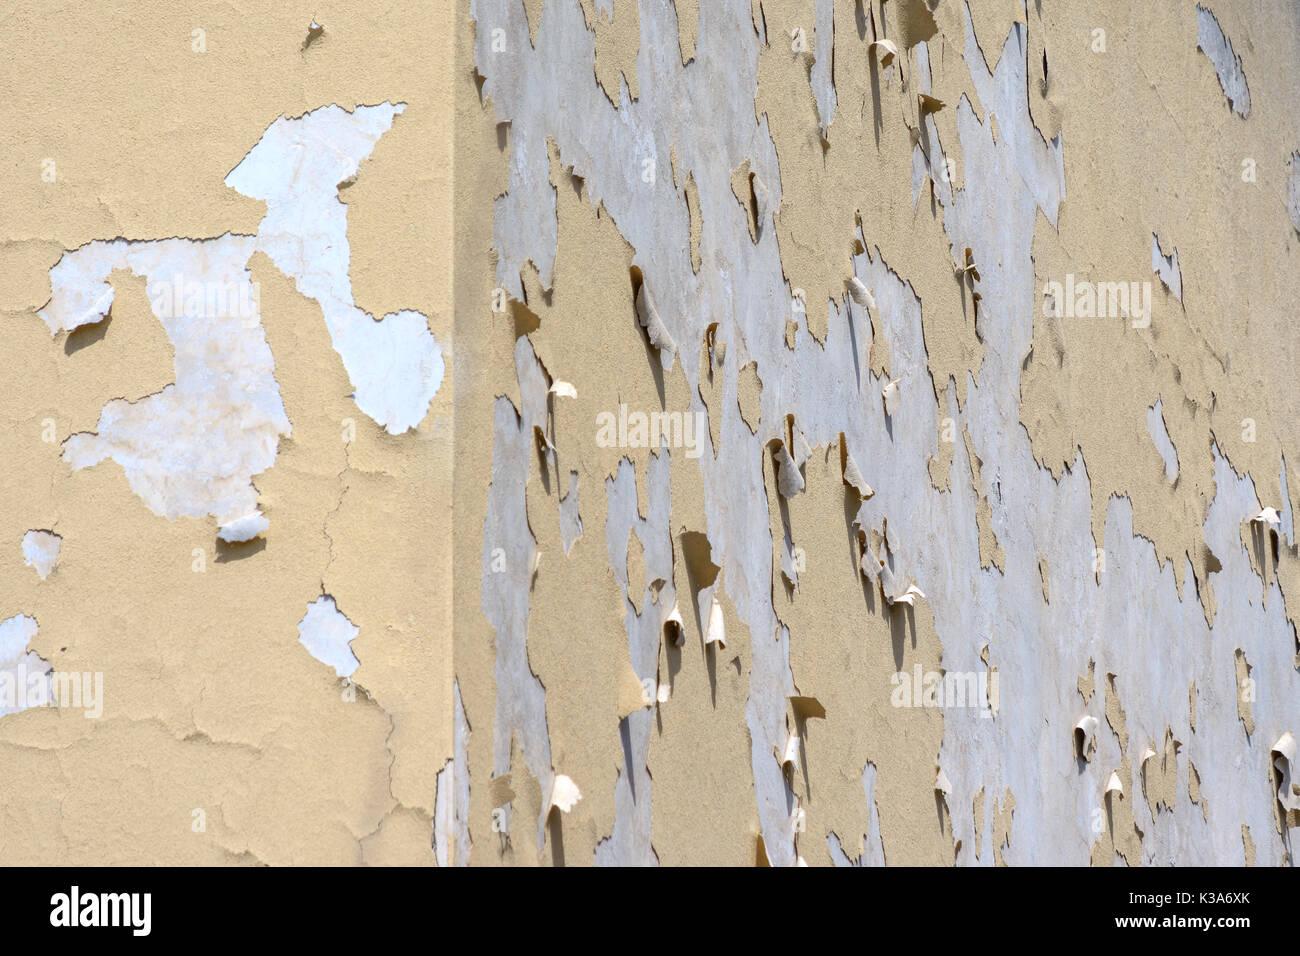 Fachada de edificio de pared en ruinas Imagen De Stock